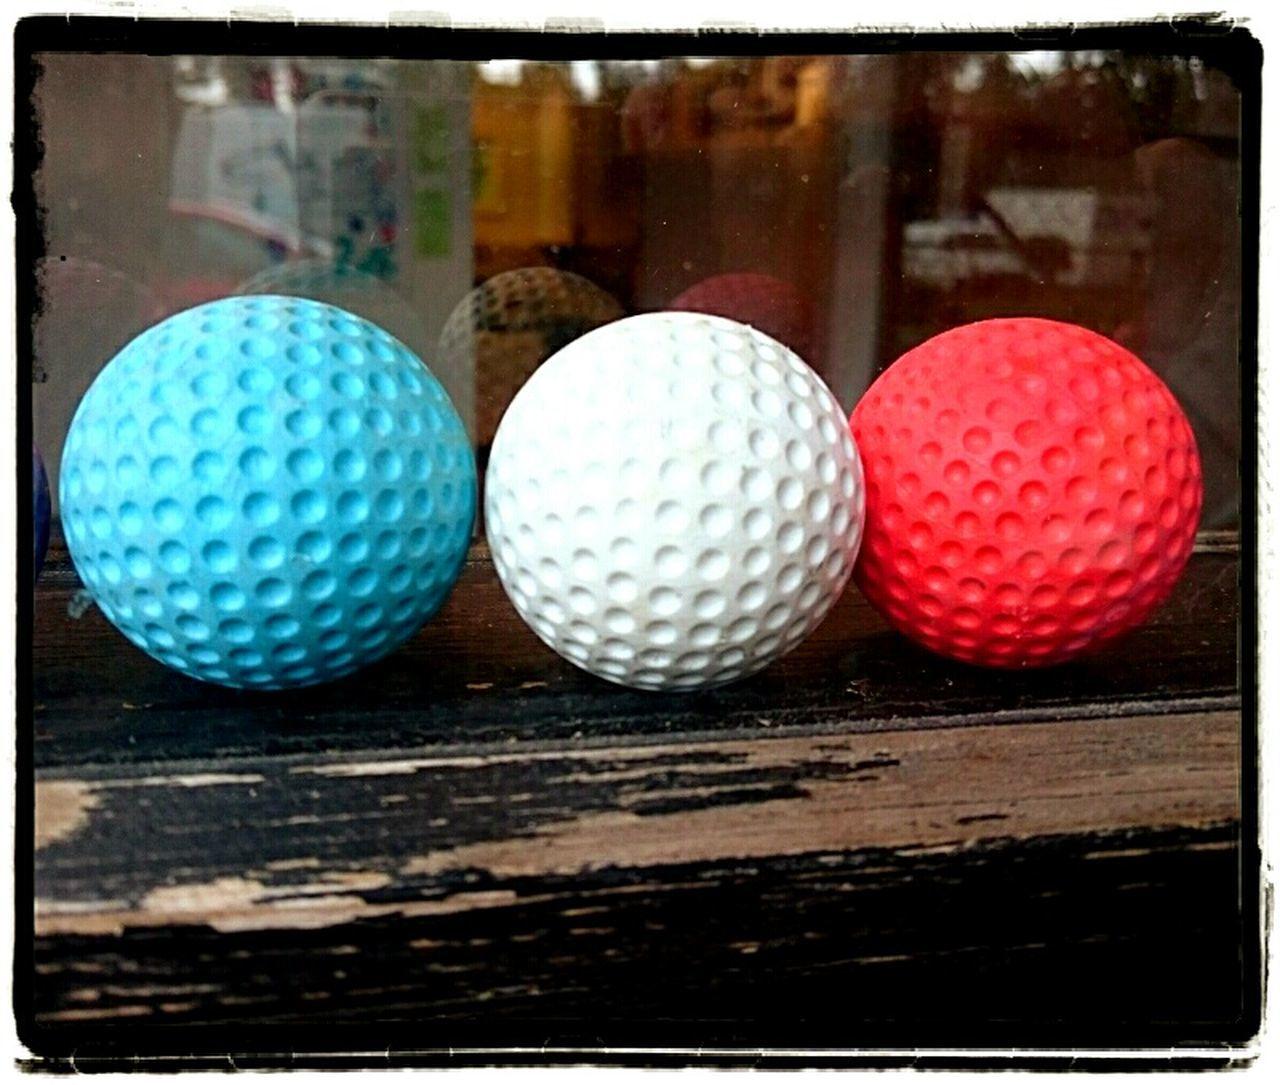 Golf Golfball Goofballs Minigolf Minigolfcourse Balls Colours Redwhiteandblue Dimples